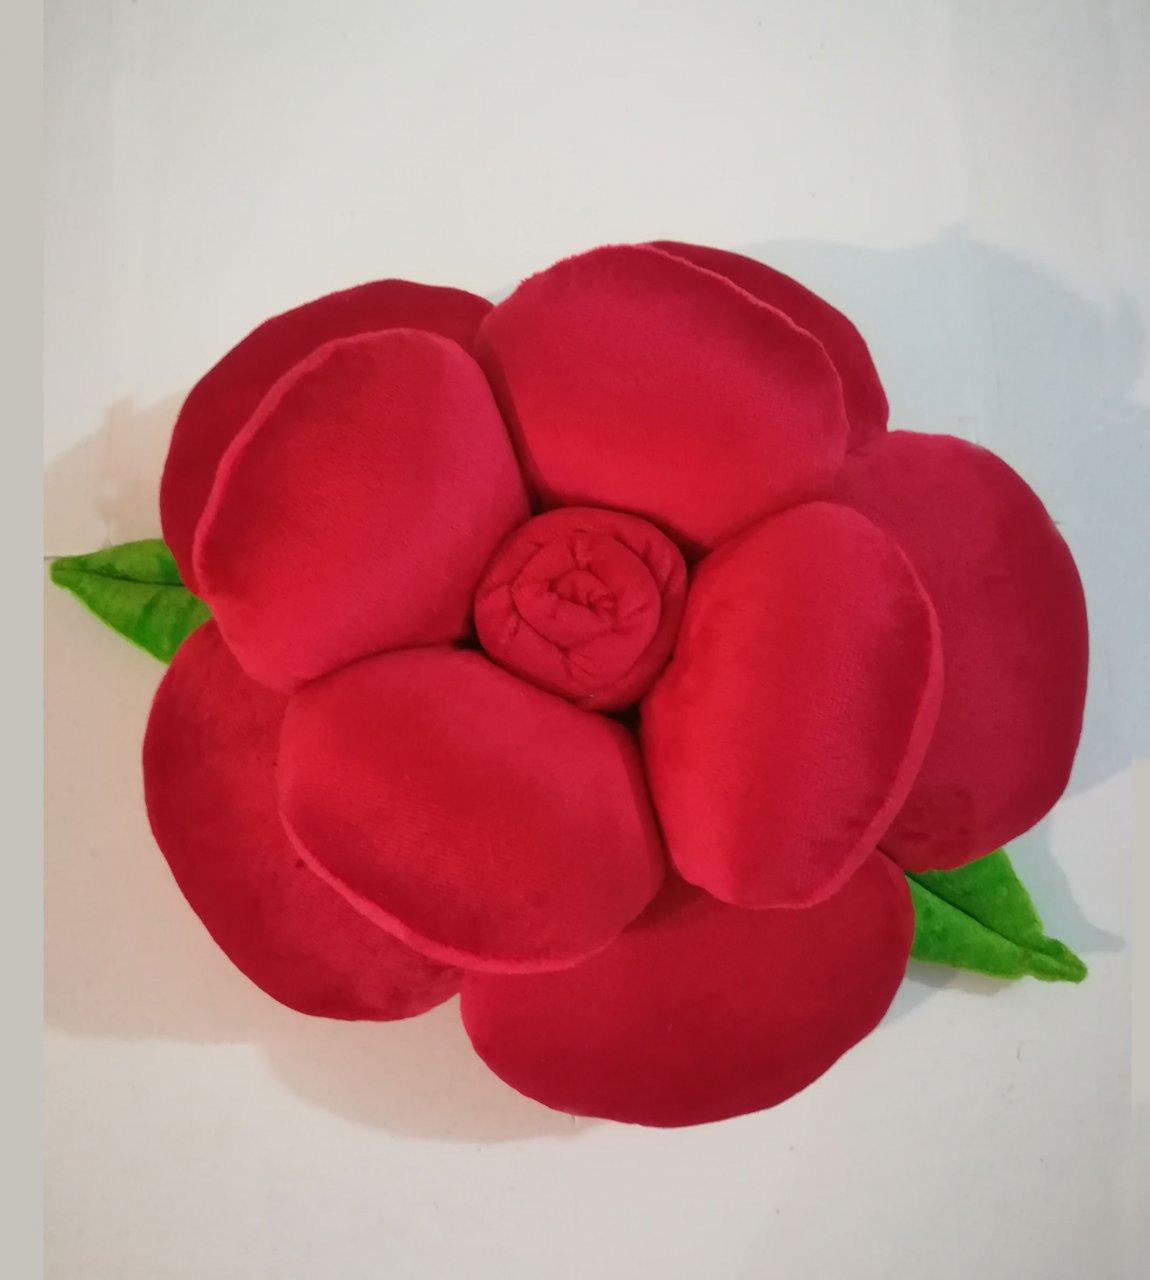 کوسن طرح گل قرمز